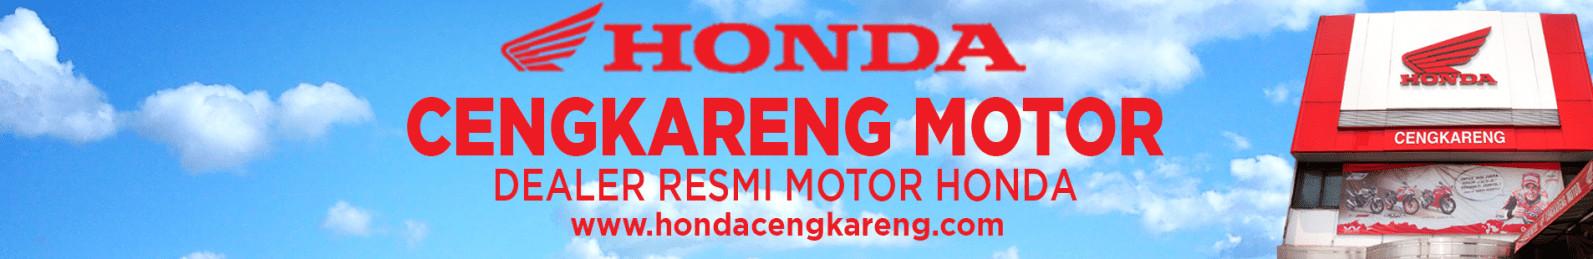 Honda Cengkareng